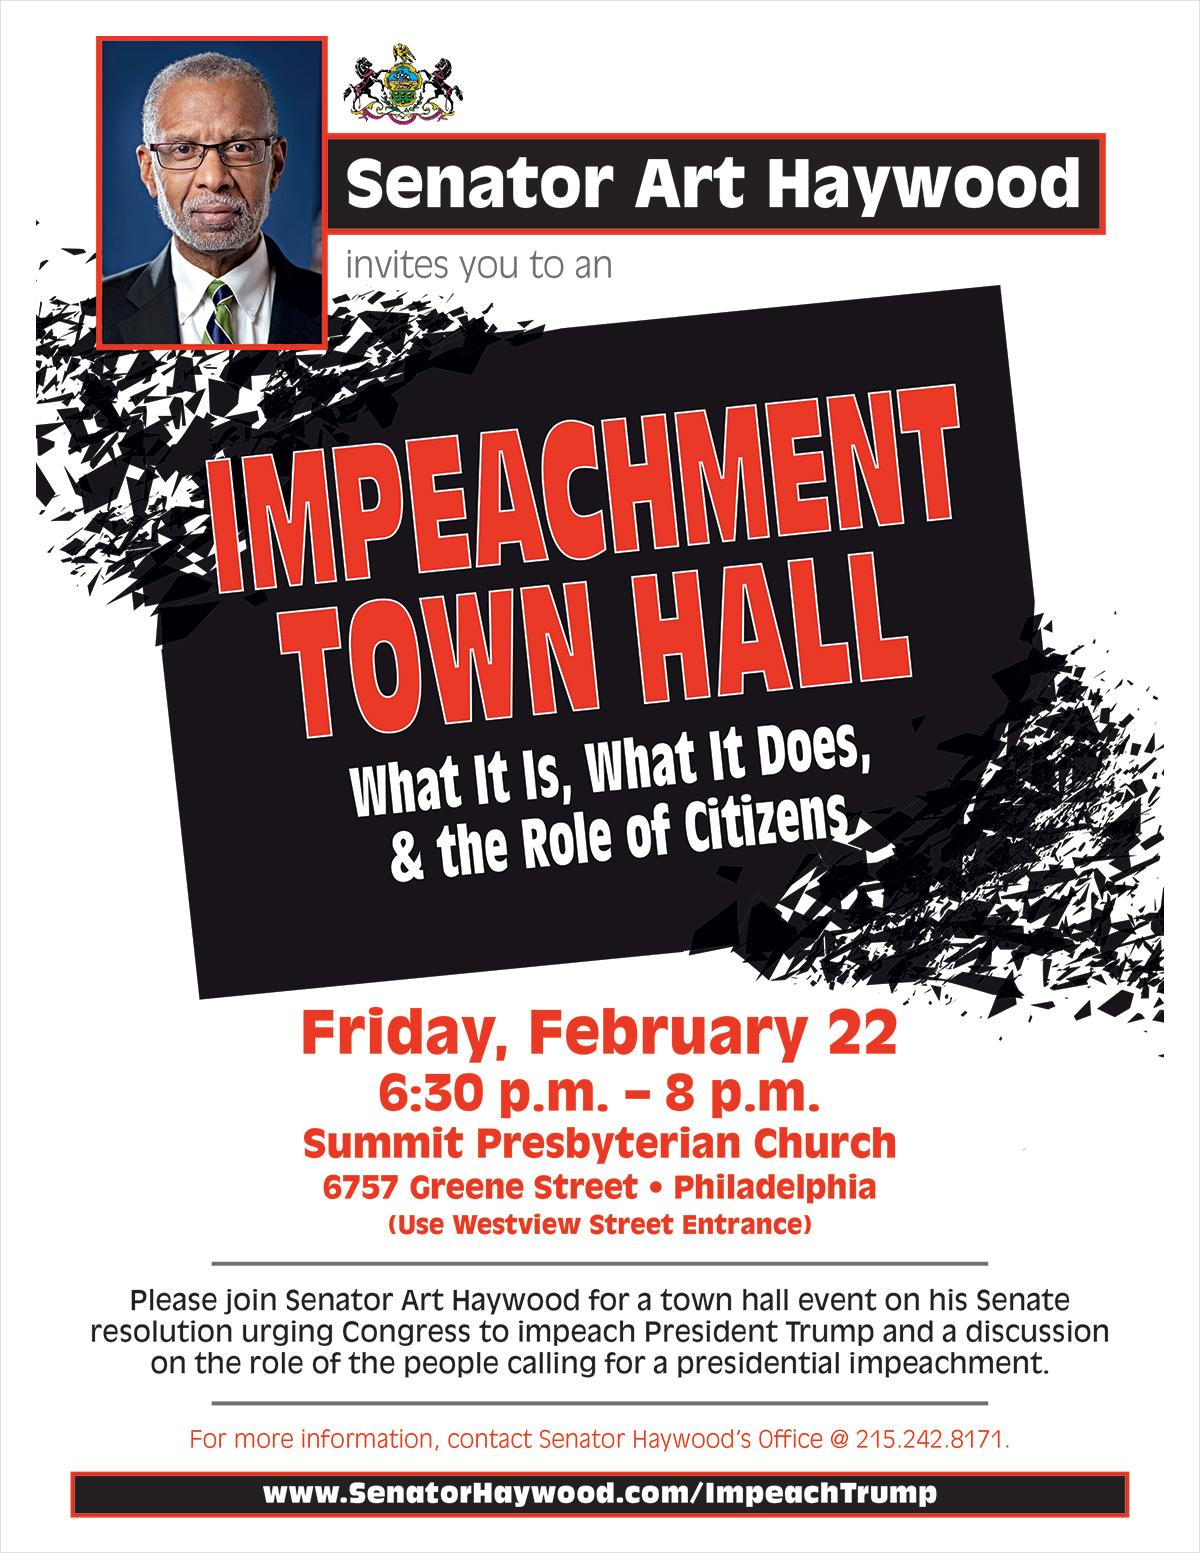 Impeachment Town Hall